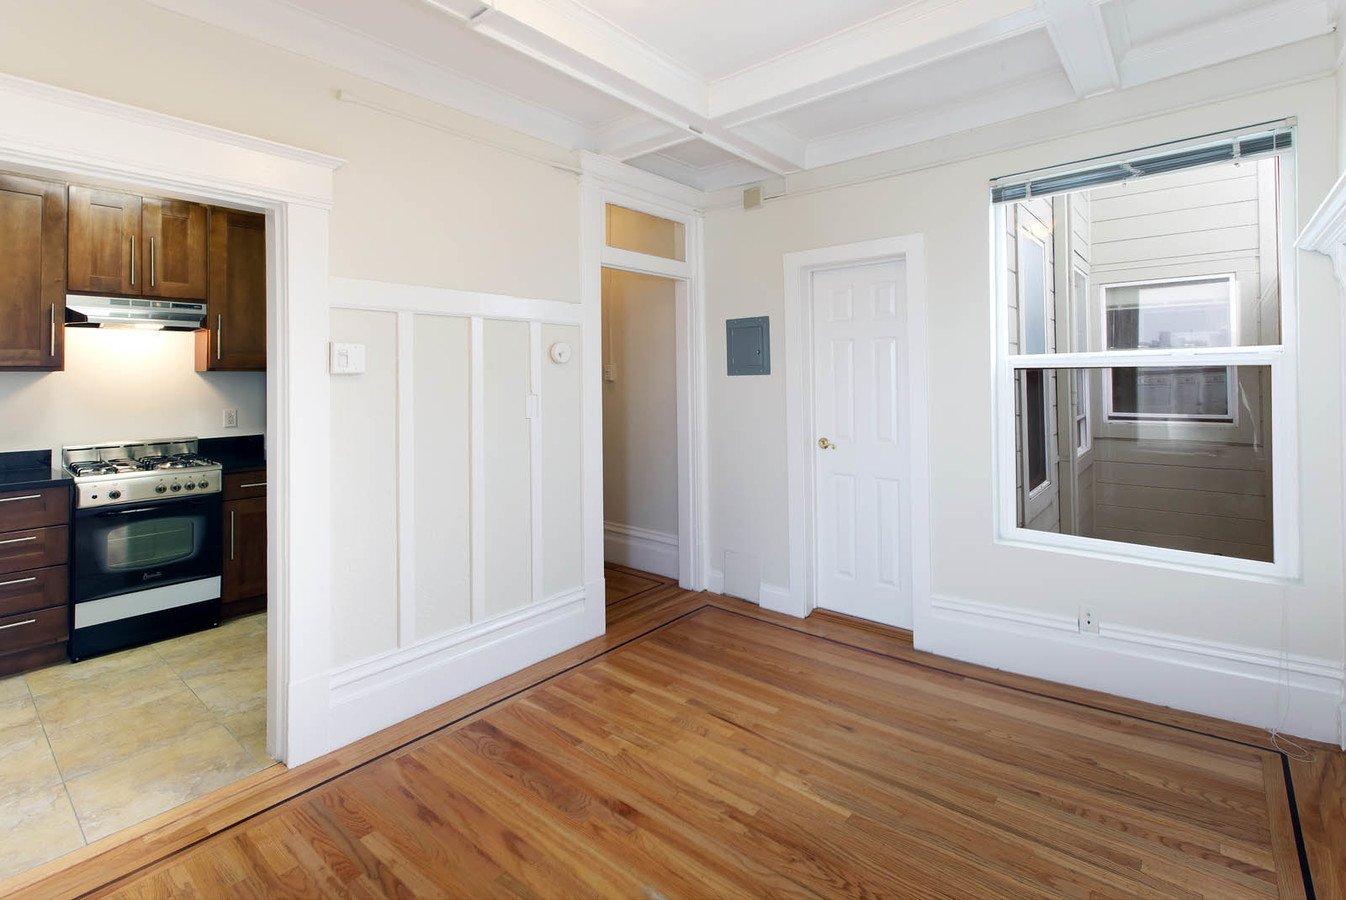 Studio 1 Bathroom Apartment for rent at 1301 Leavenworth Apartments in San Francisco, CA